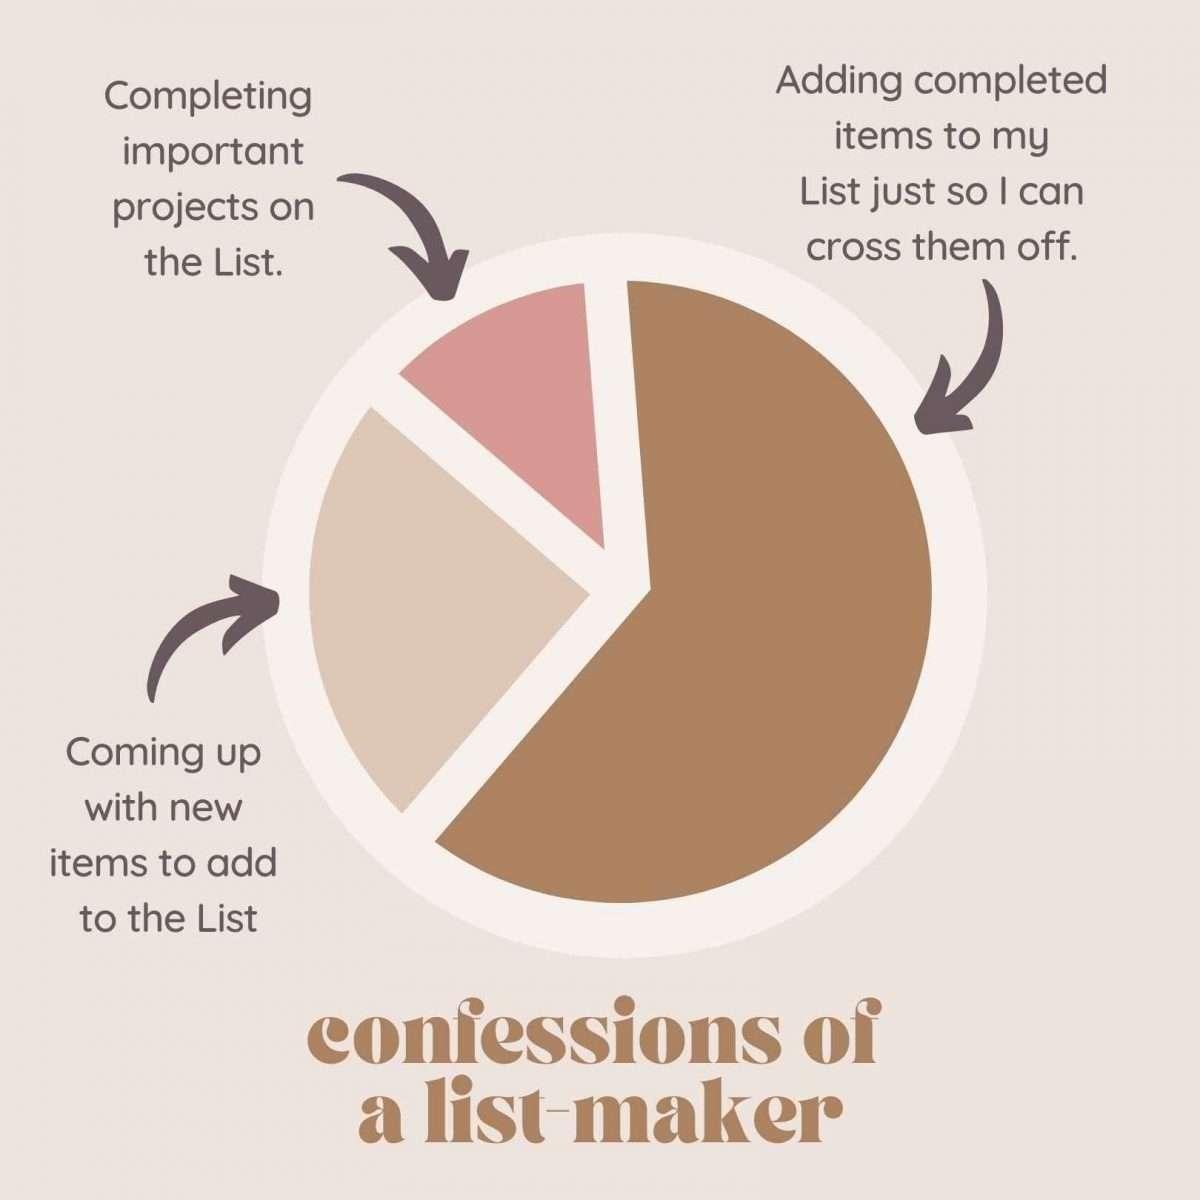 List Maker Checklist Canva Template - Editable Canva Template by Socially Sorted, October Social Media Ideas